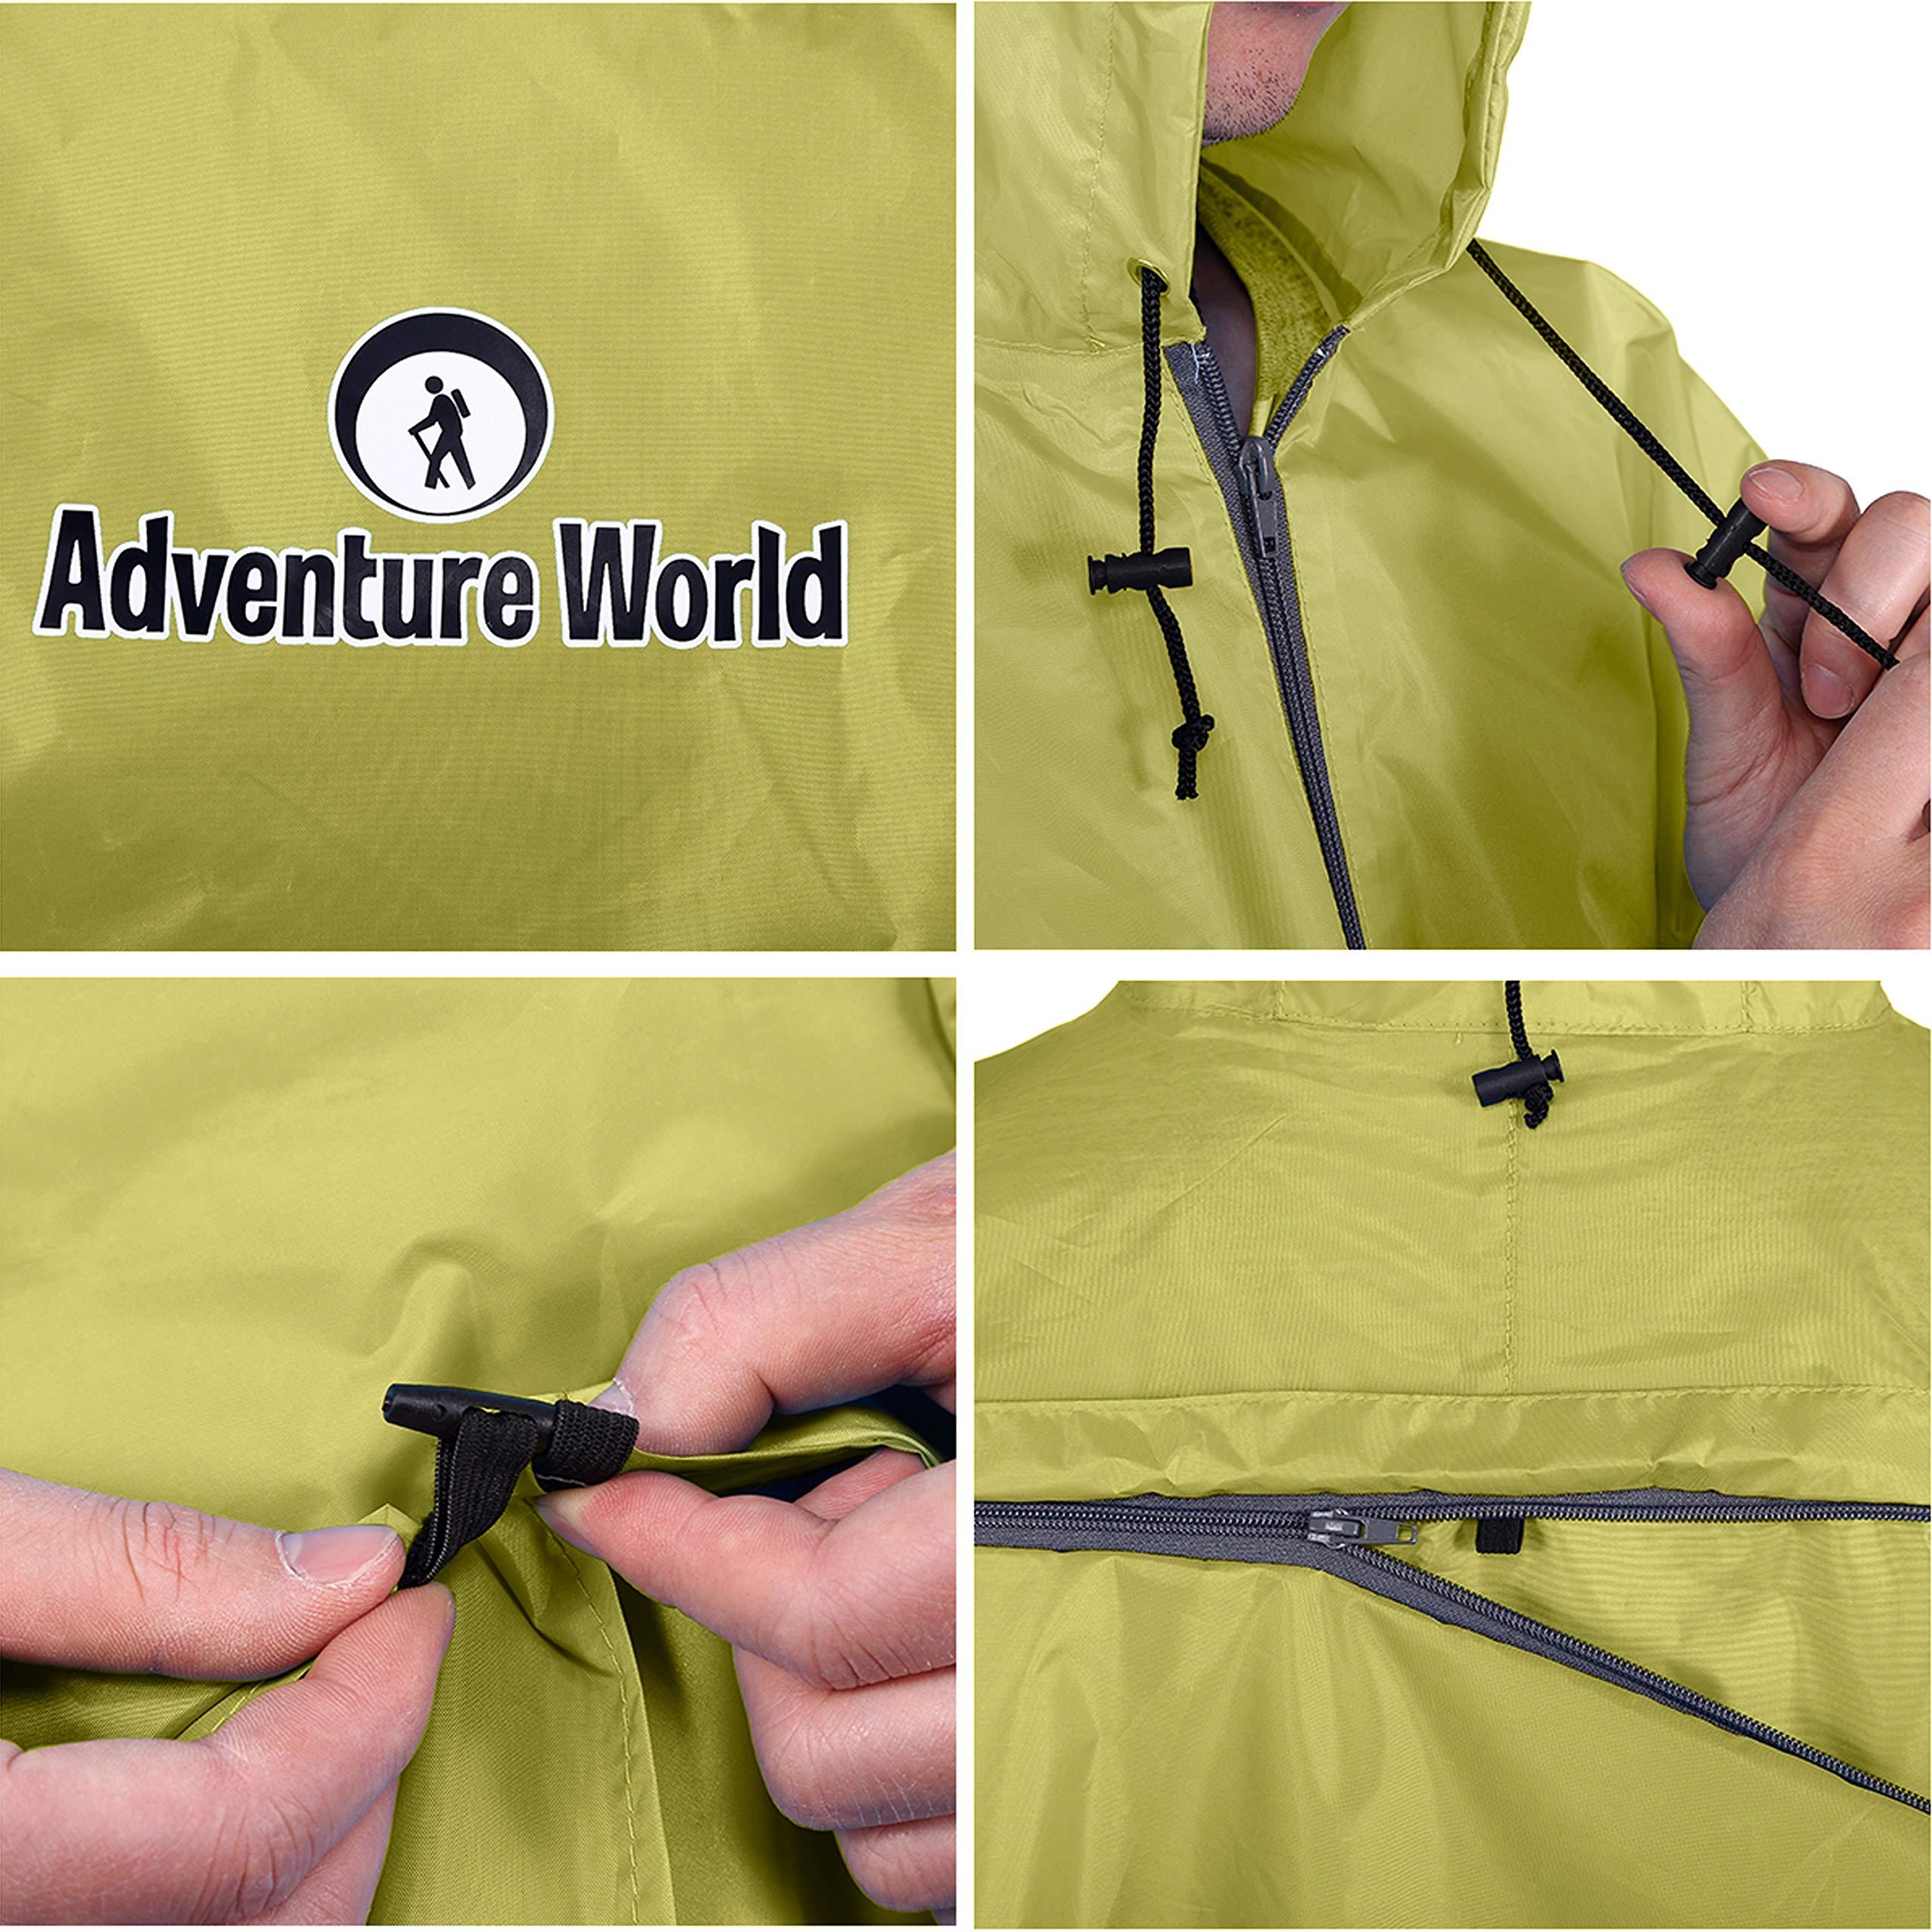 Adventure World Globotrekker Lightweight Backpack Poncho Multiple Color Options Available